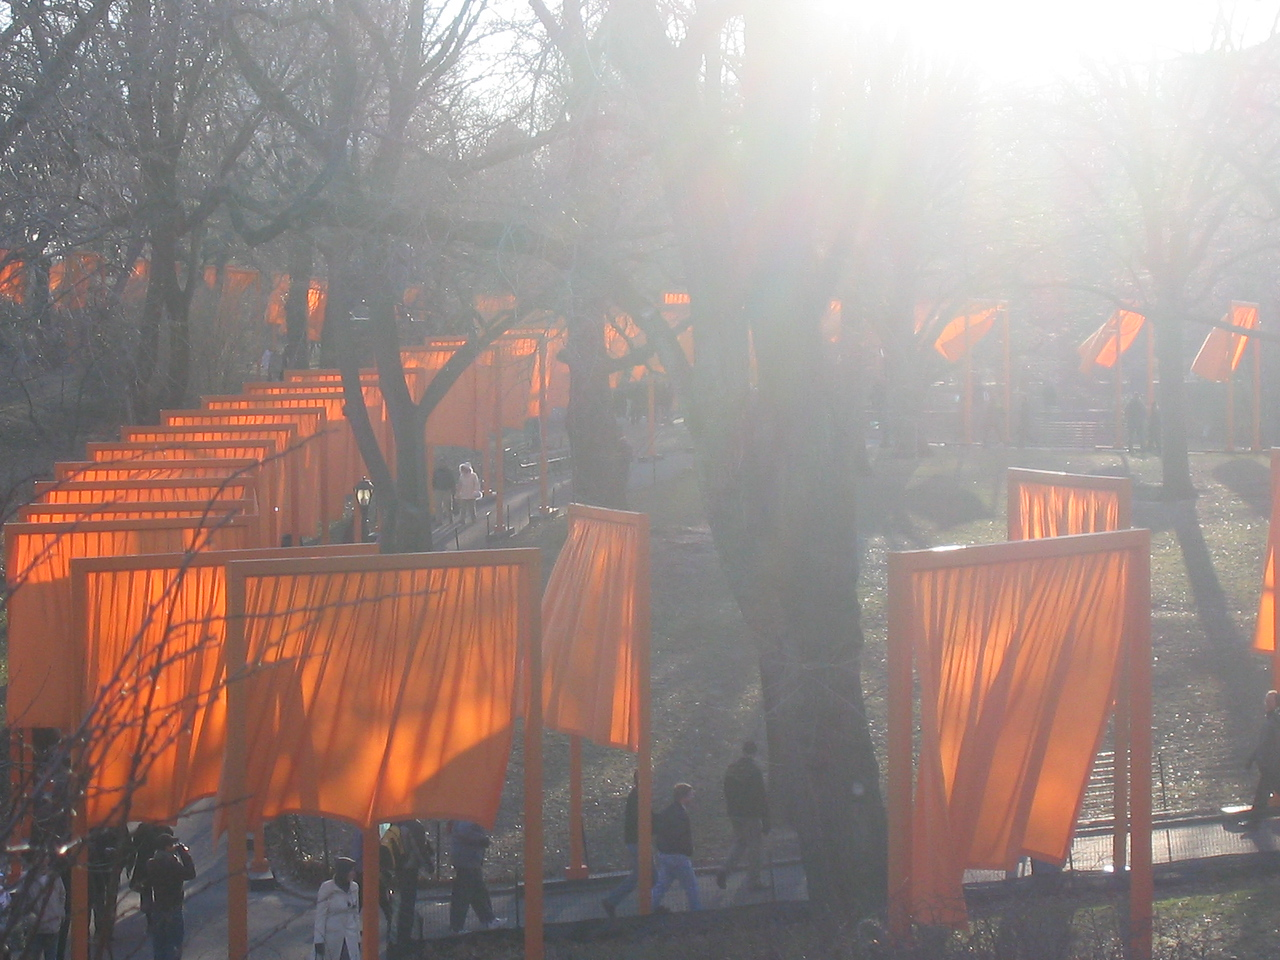 Above gates